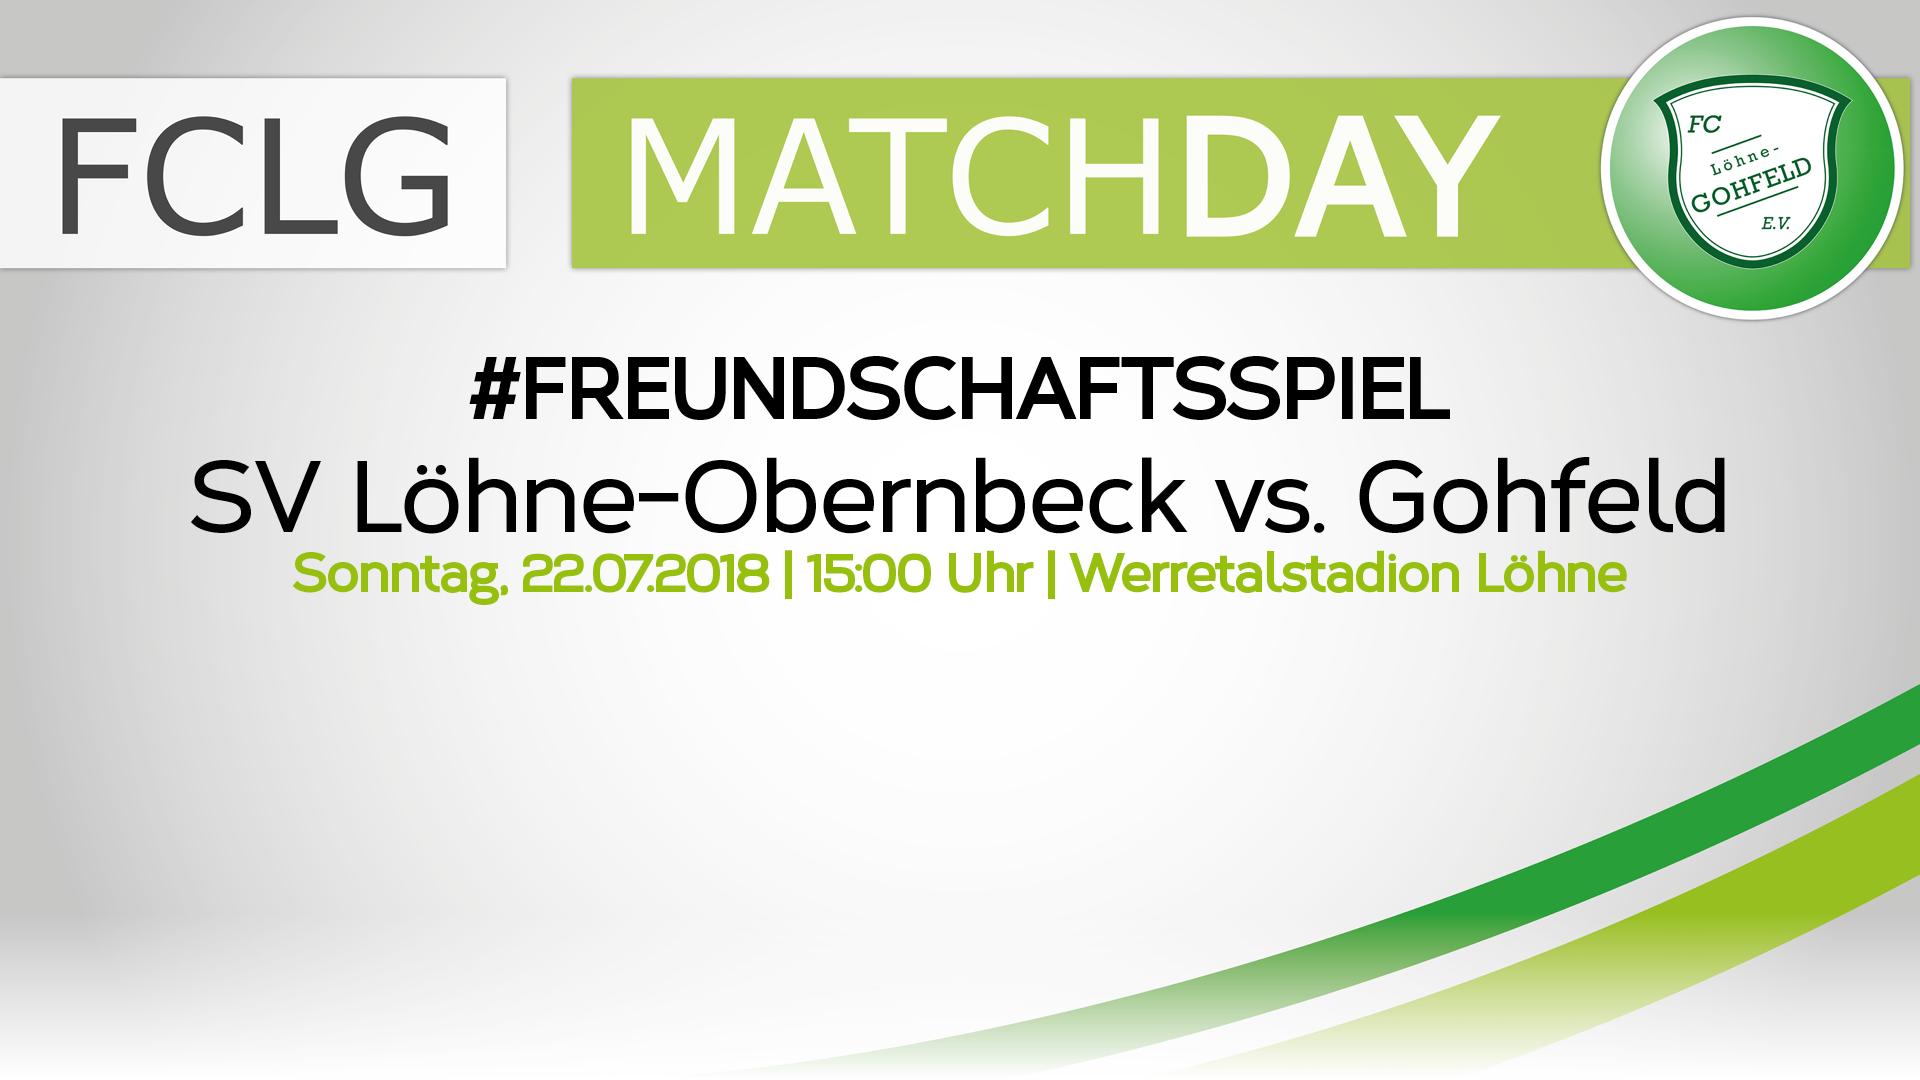 SV Löhne-Obernbeck vs. Gohfeld